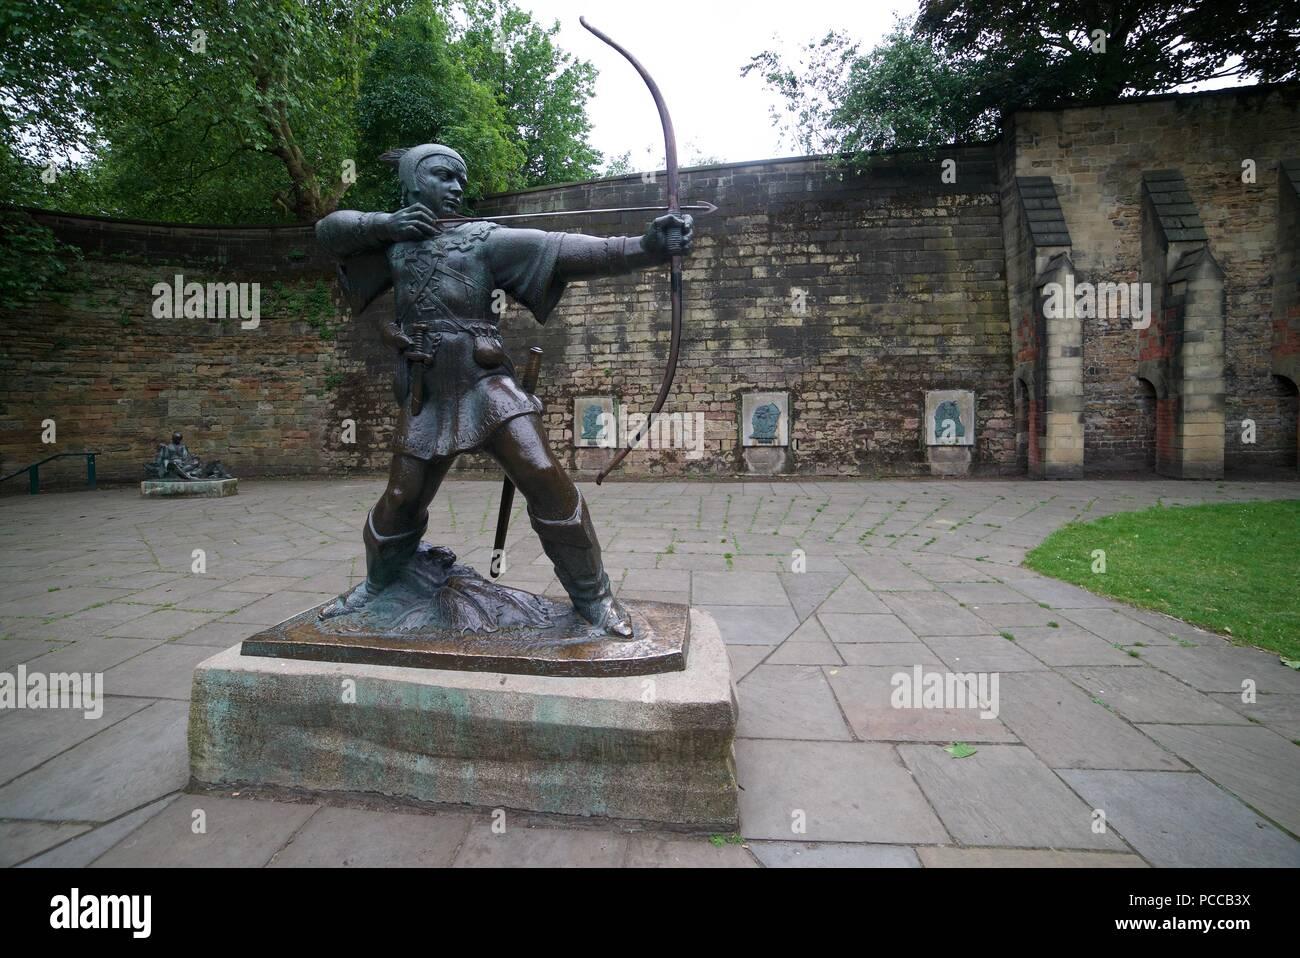 The Robin Hood statue in Nottingham City Centre (Castle Road, Nottingham, Nottinghamshire, United Kingdom) - Stock Image